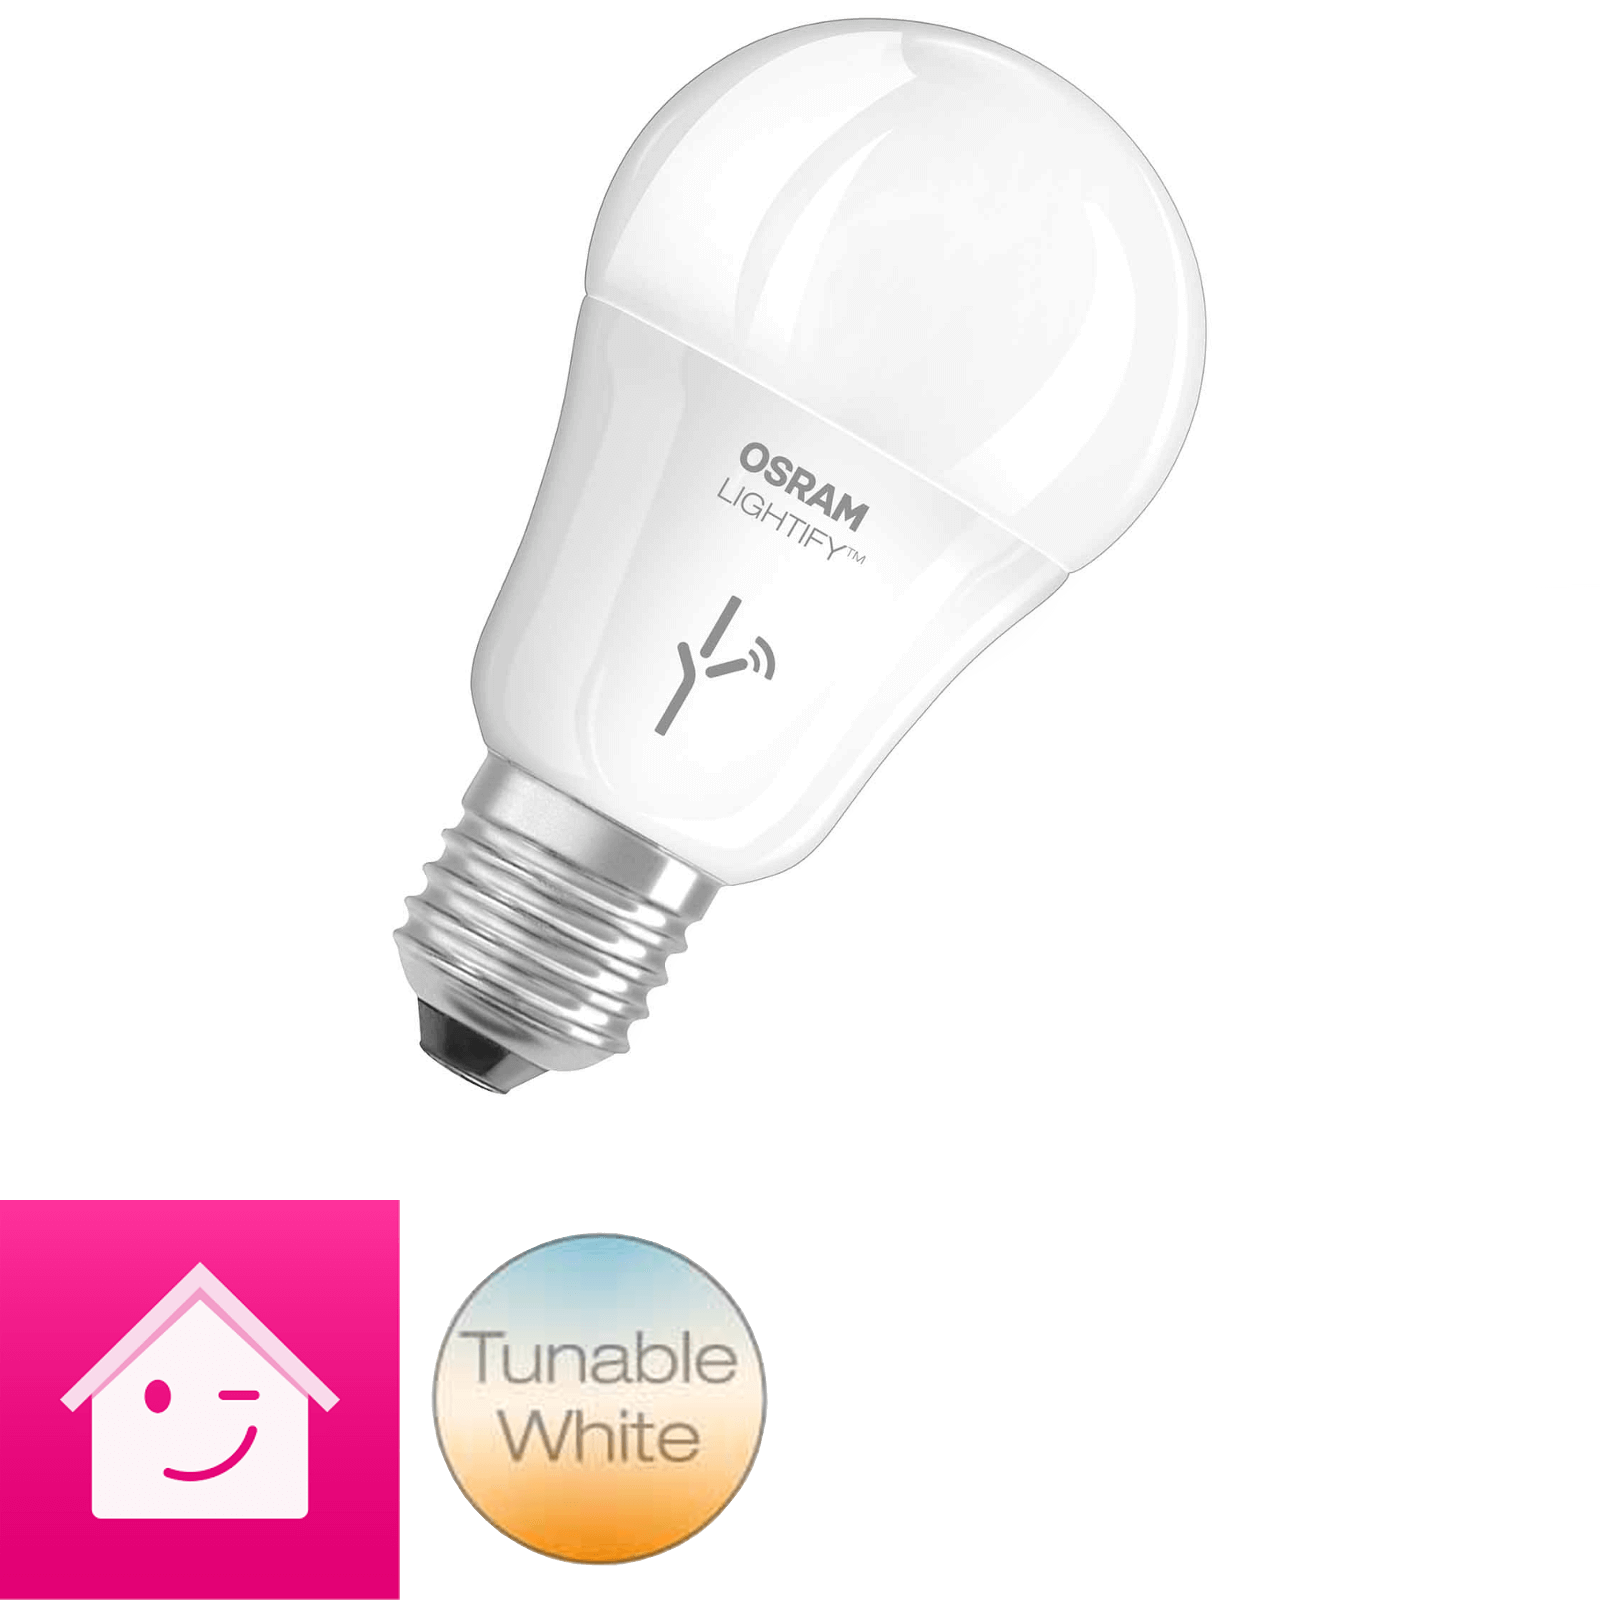 OSRAM LIGHTIFY CLASSIC A LED-Glühlampe Tunable White / dimmbar / warmweiß  2700K - 6500K